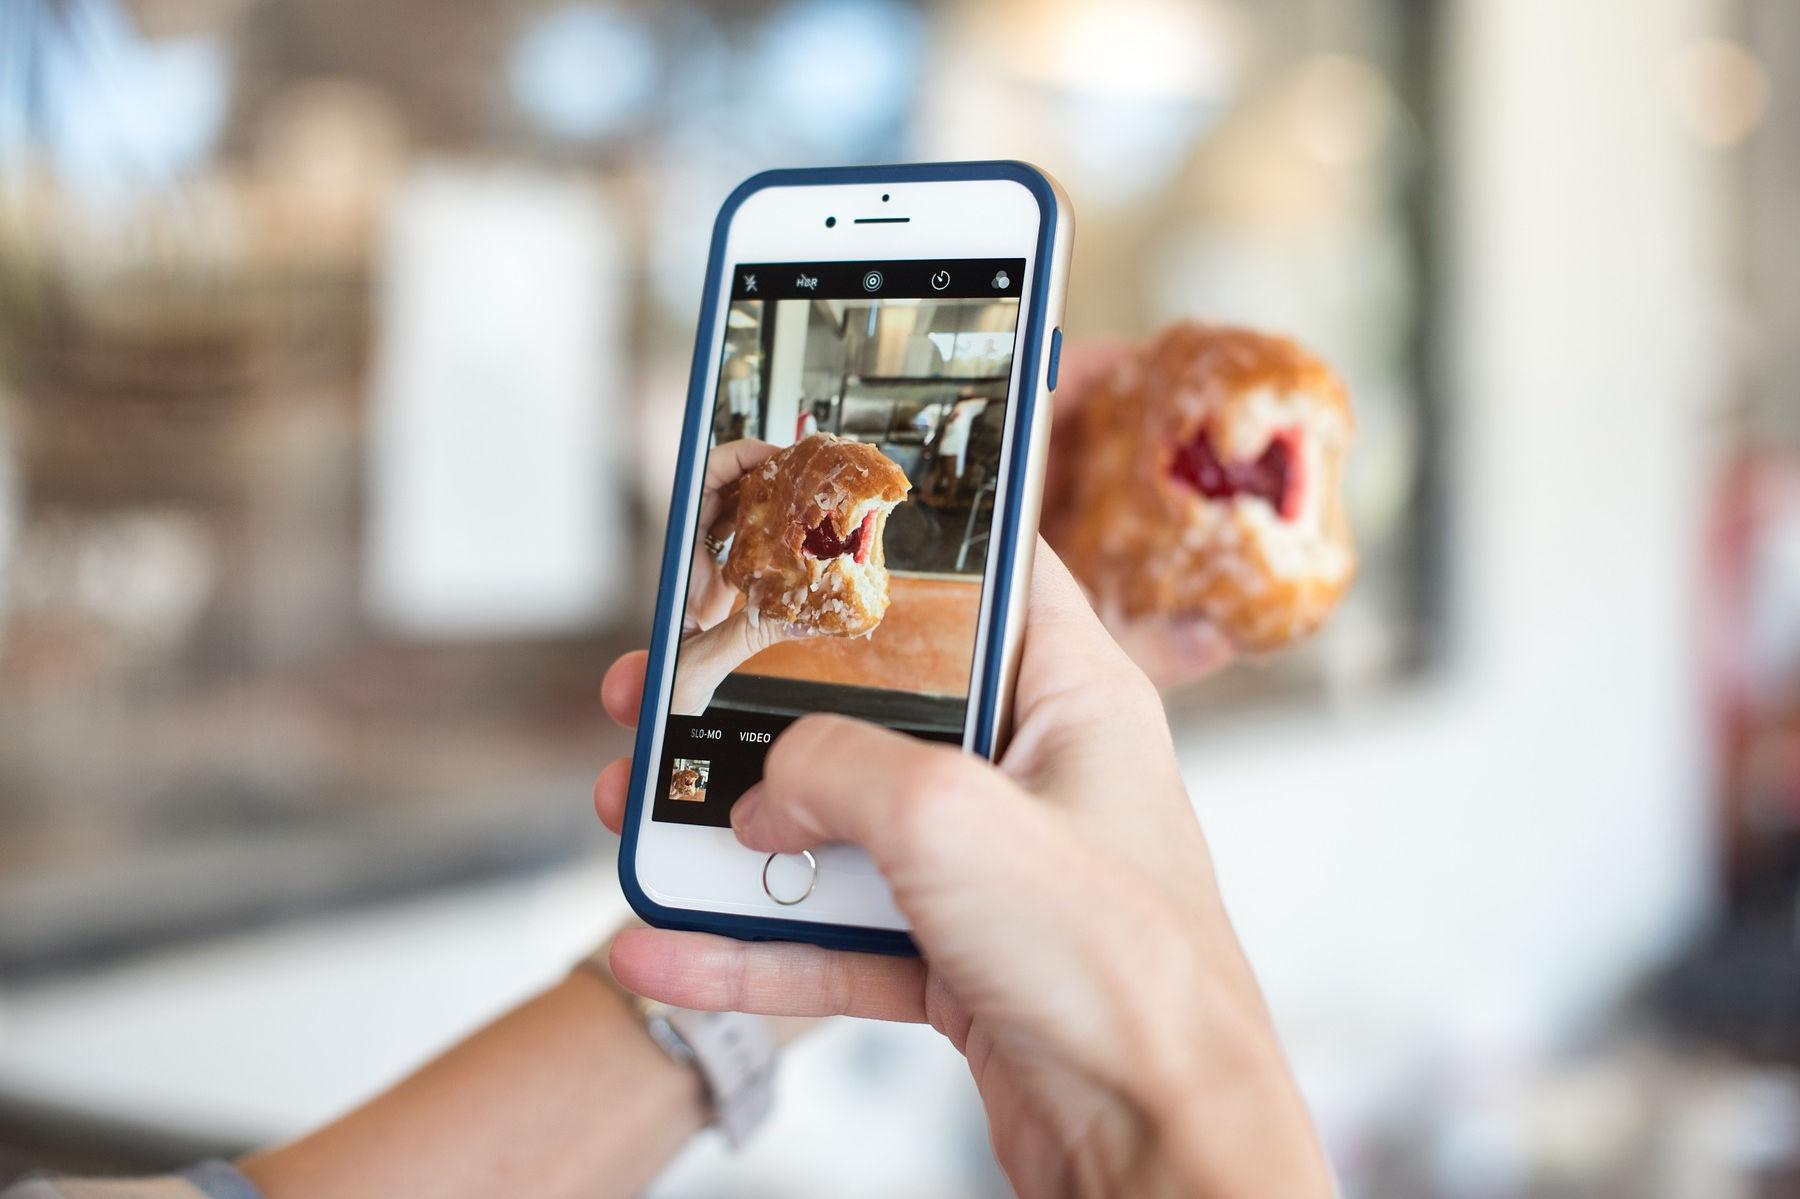 Corso online di Food Photography con lo smartphone